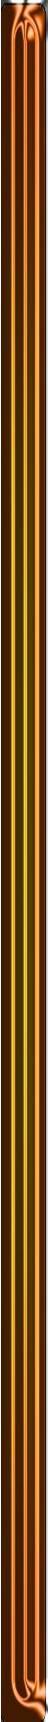 Barre separation verticale